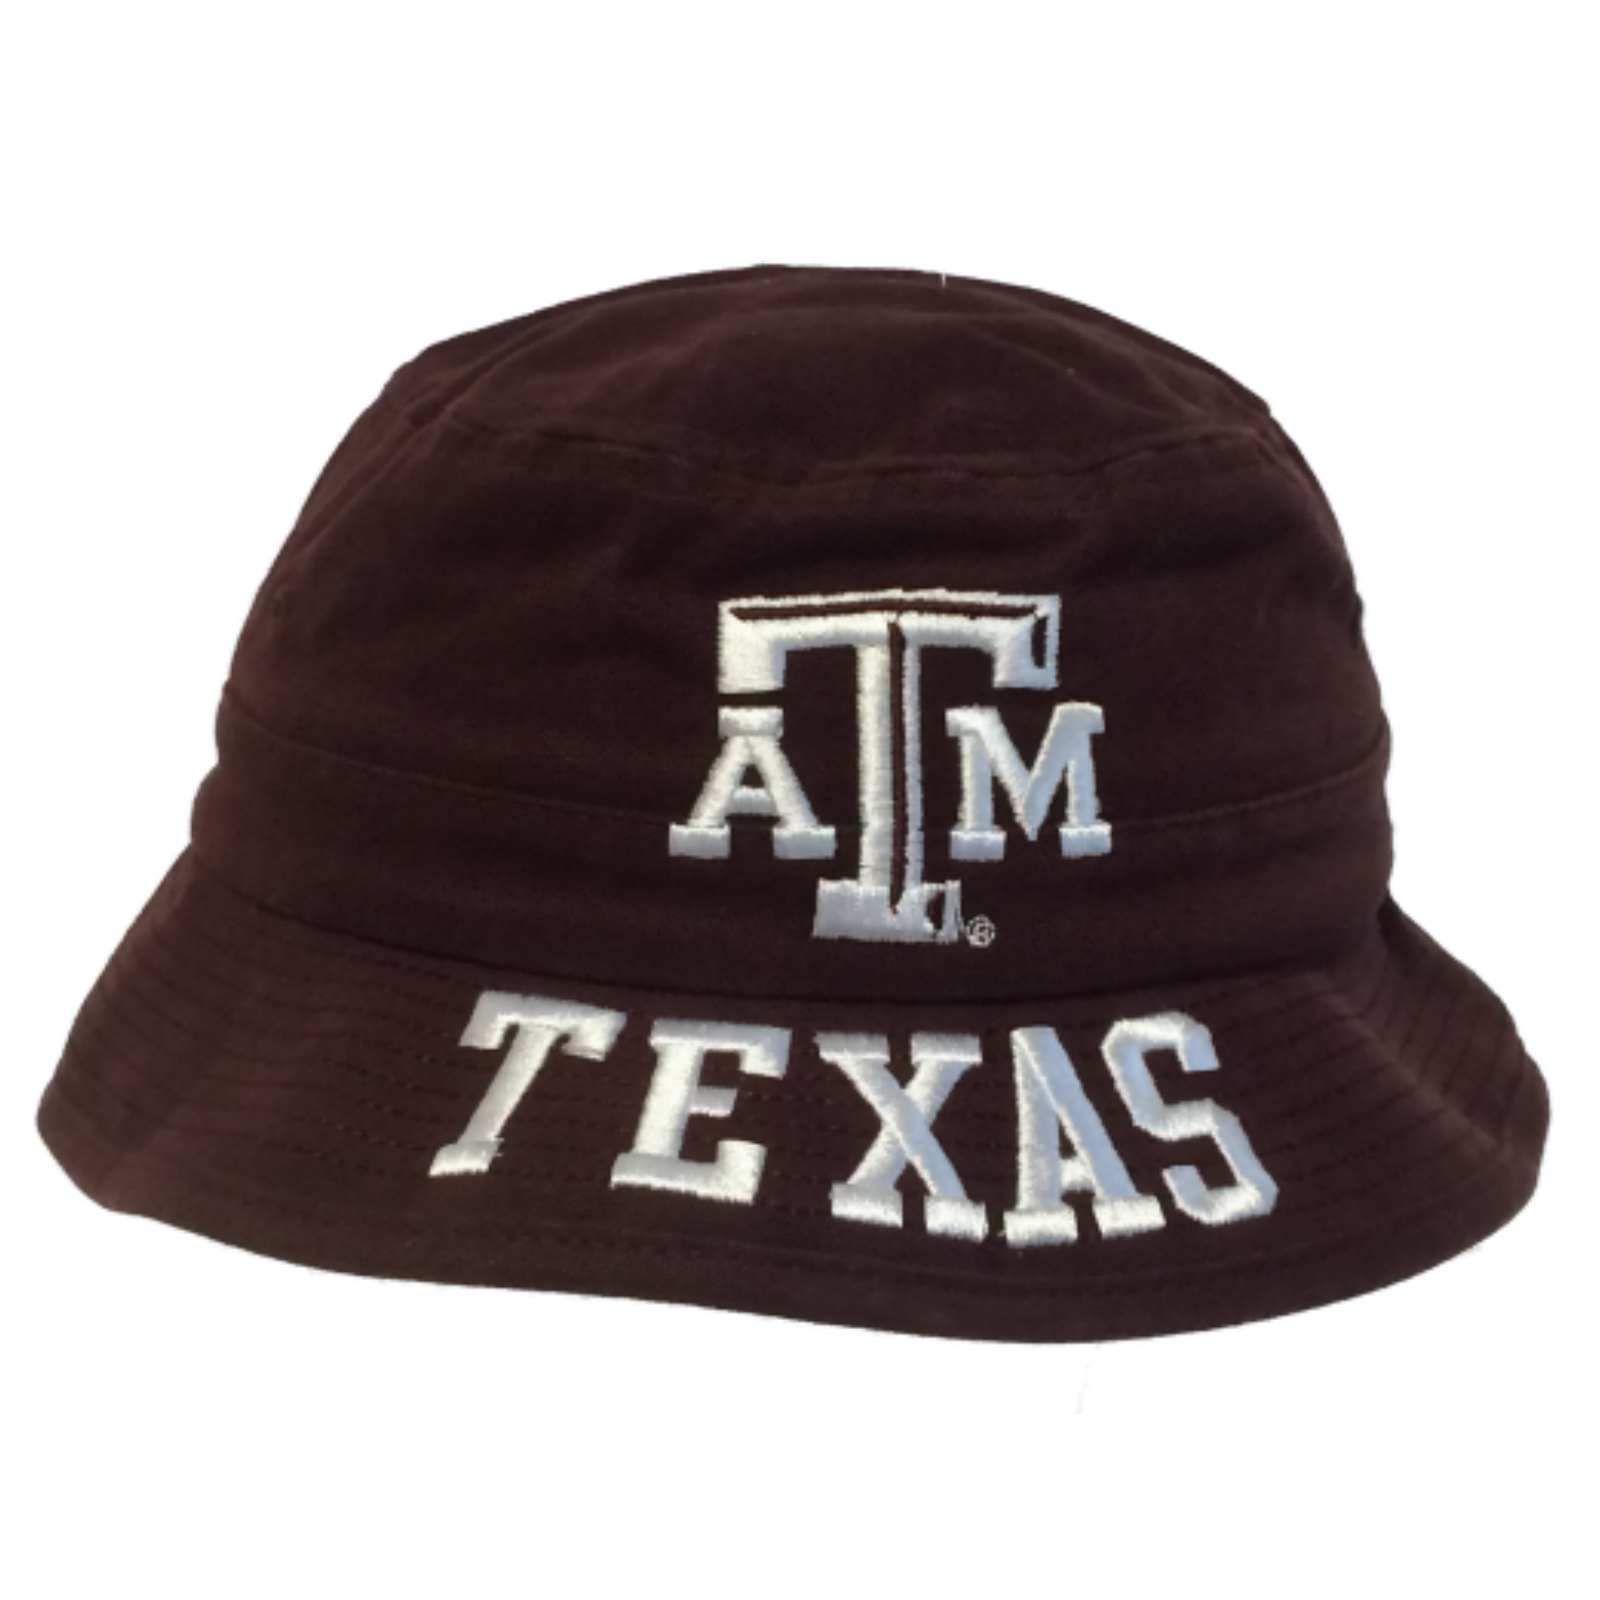 Texas A M Aggies Adidas BOYS Maroon Embroidered Bucket Hat Cap (4-7 ... 17dba846f35